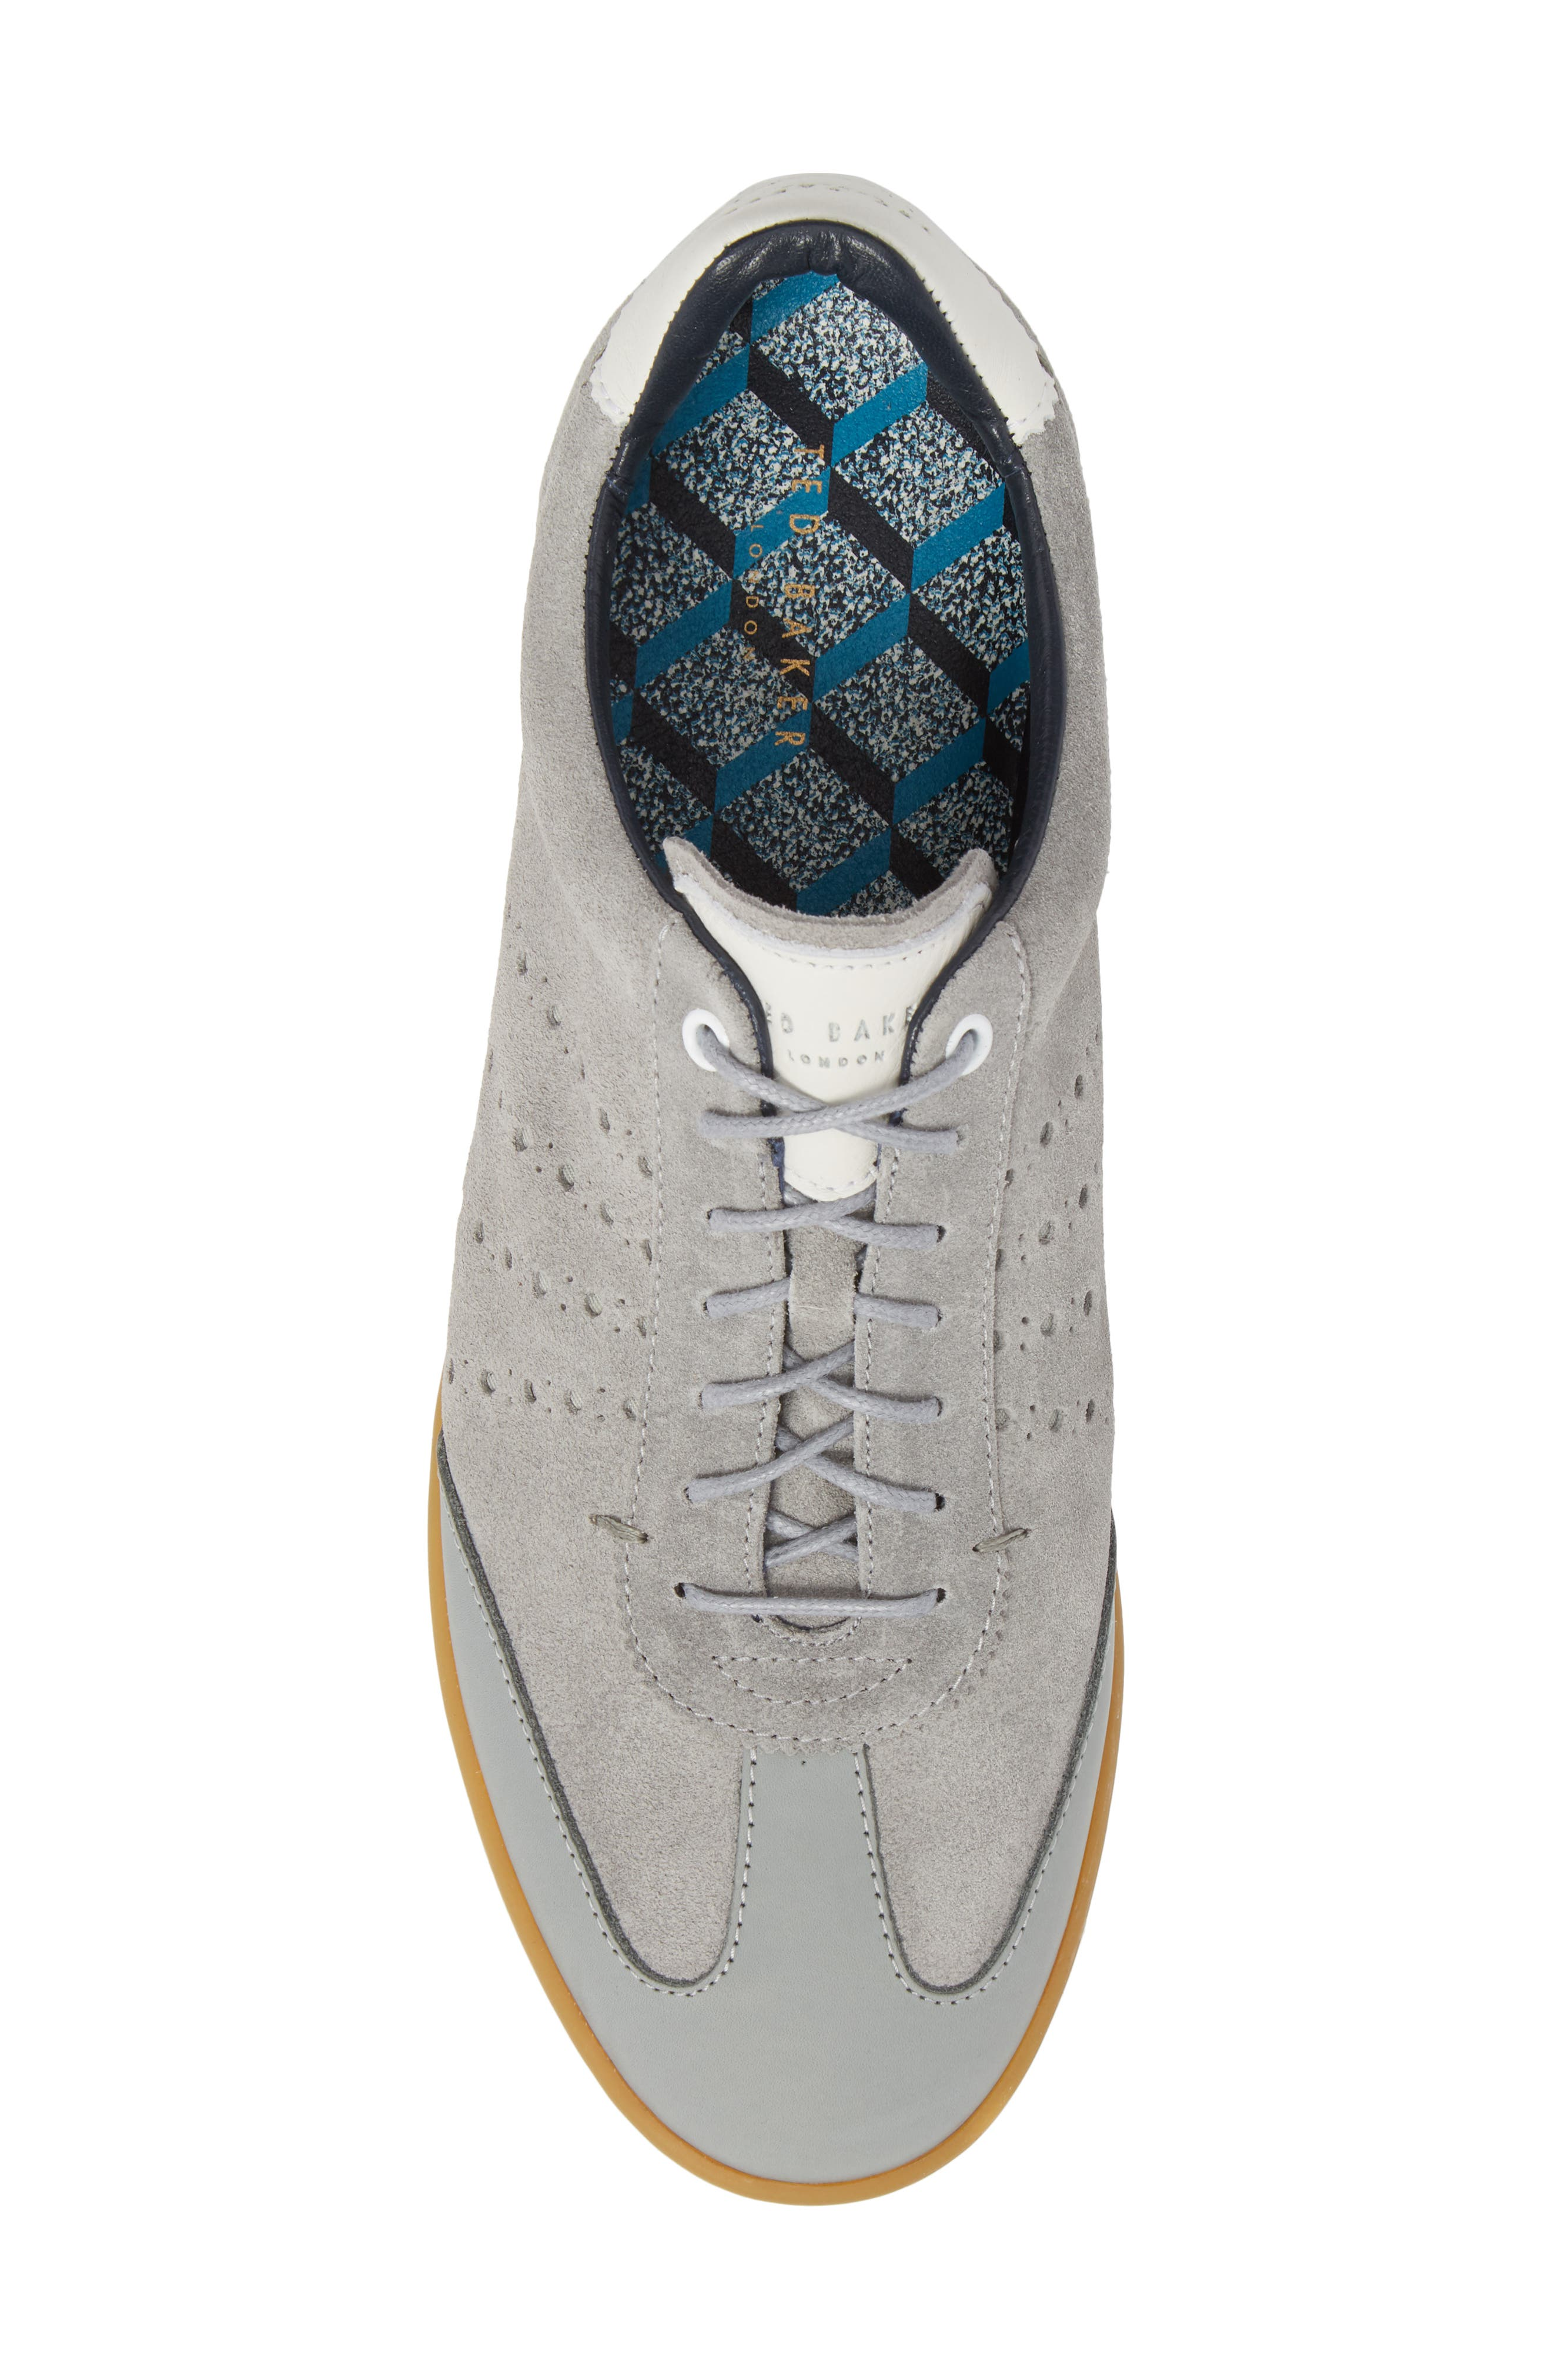 Orlees Low Top Sneaker,                             Alternate thumbnail 5, color,                             052